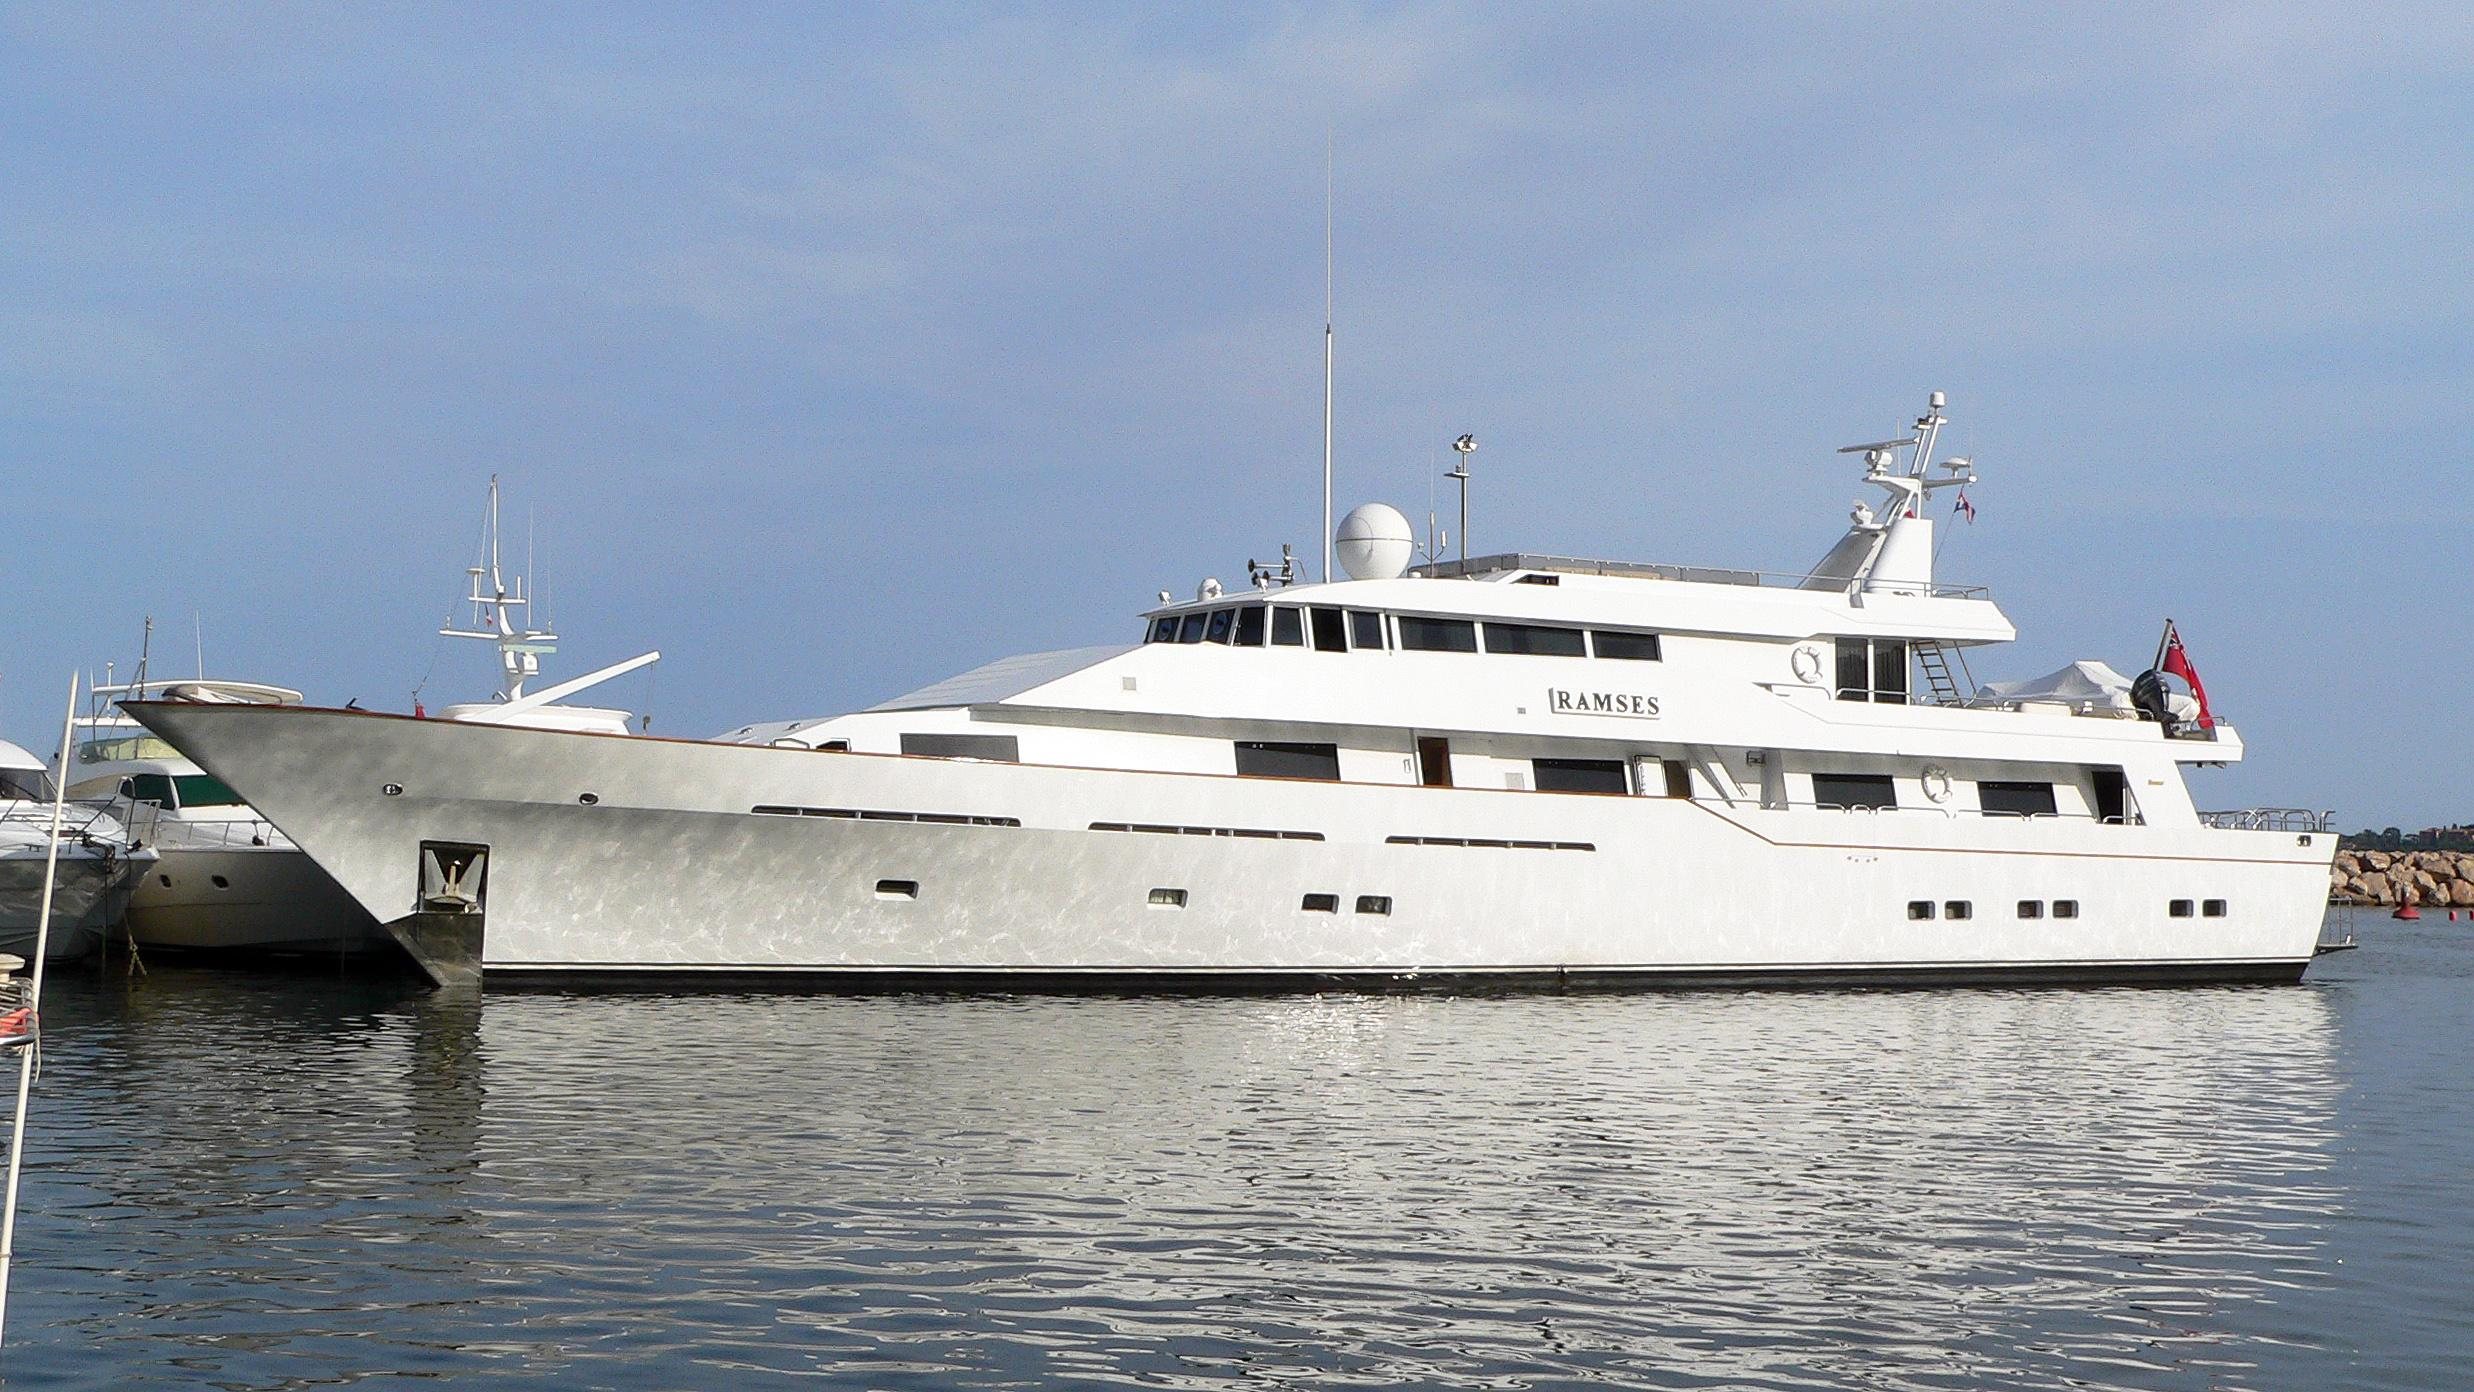 bucket-list-motor-yacht-feadship-1981-43m-profile